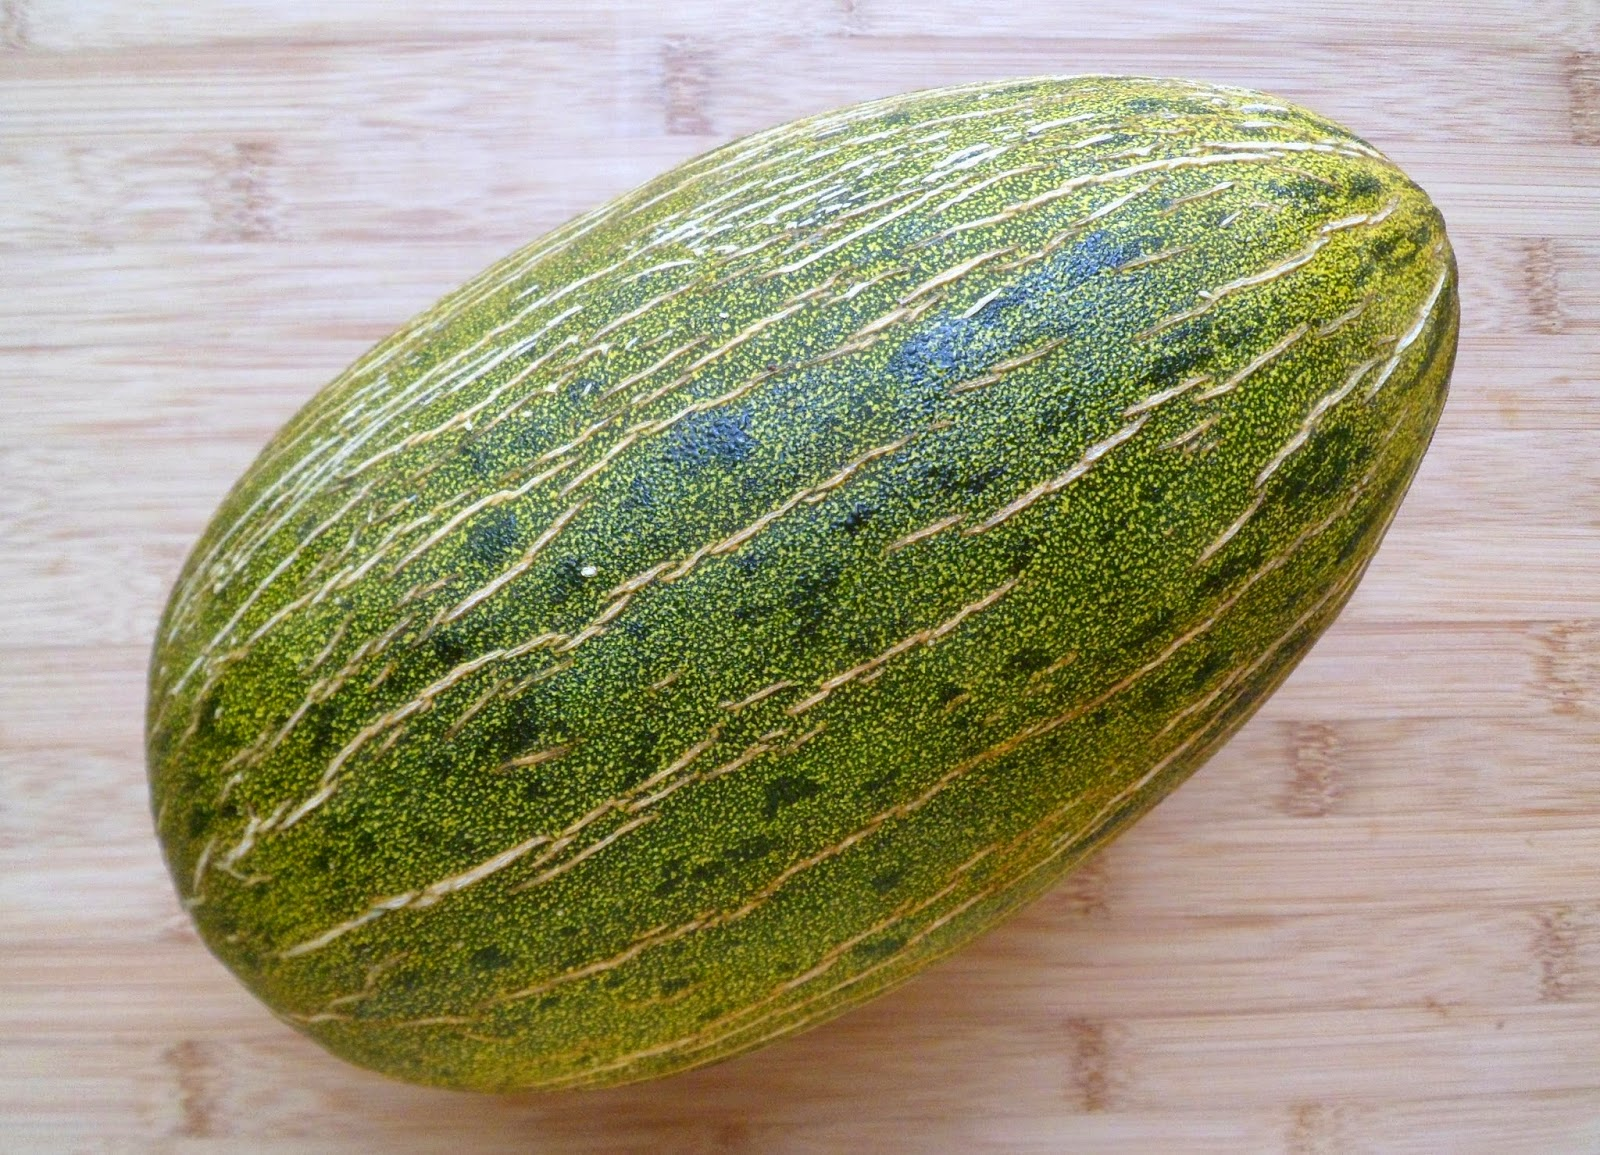 Les crocs du loupinet gel e de melon vert - Quand cueillir un melon ...